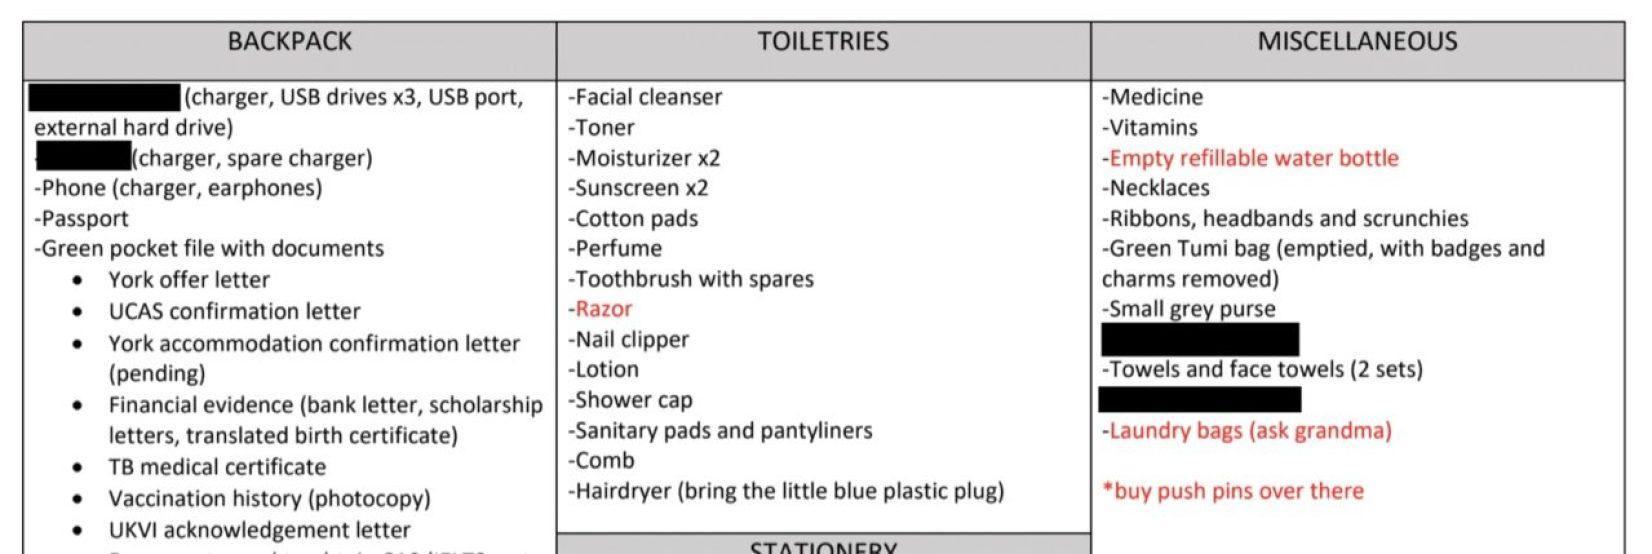 A print screen insert of a packing list